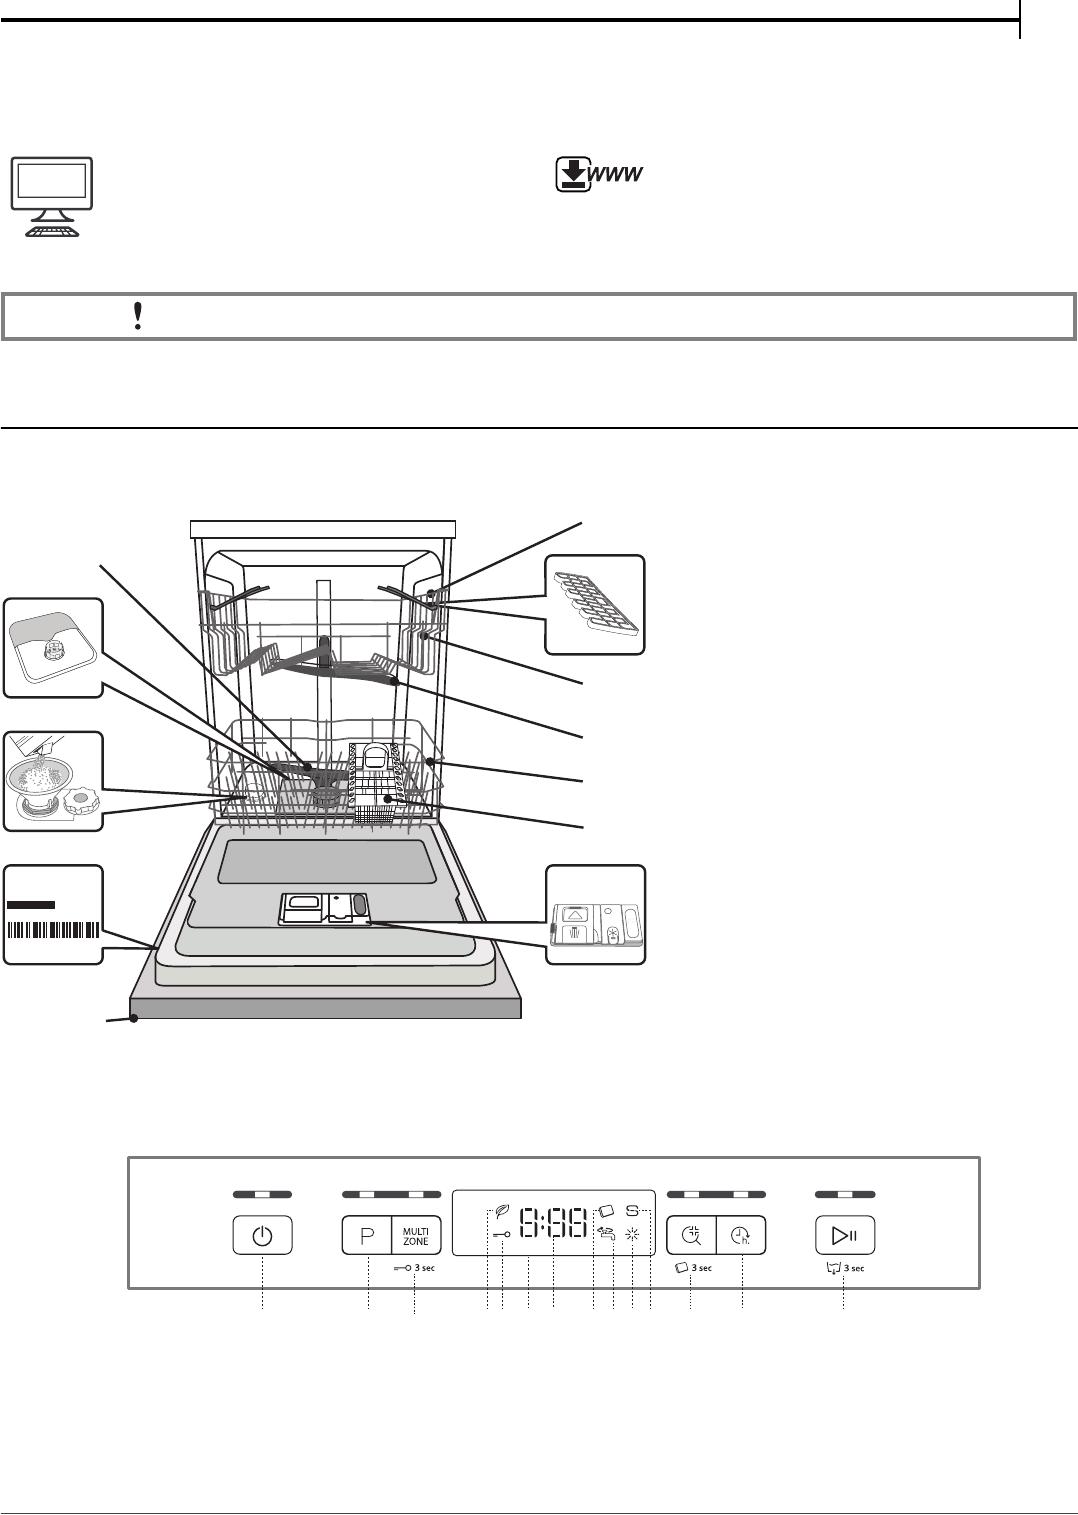 Handleiding Whirlpool Wbc 3c26 X Pagina 1 Van 8 English Have A Cabrio Electric Dryer It Is Flashing F22